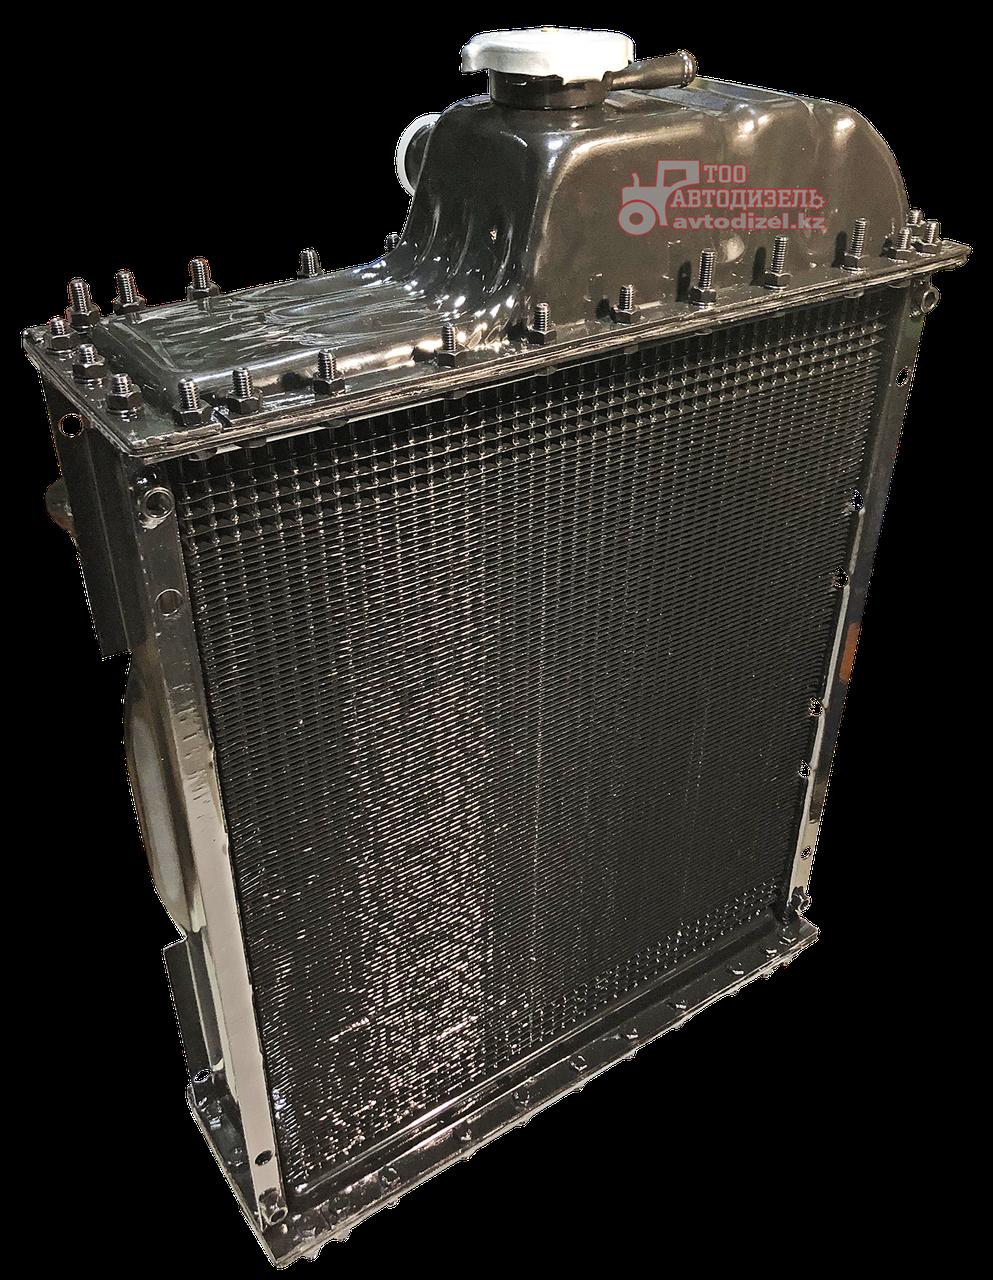 Радиатор 70У-1301010 МТЗ 80,82 медный 4-х рядный